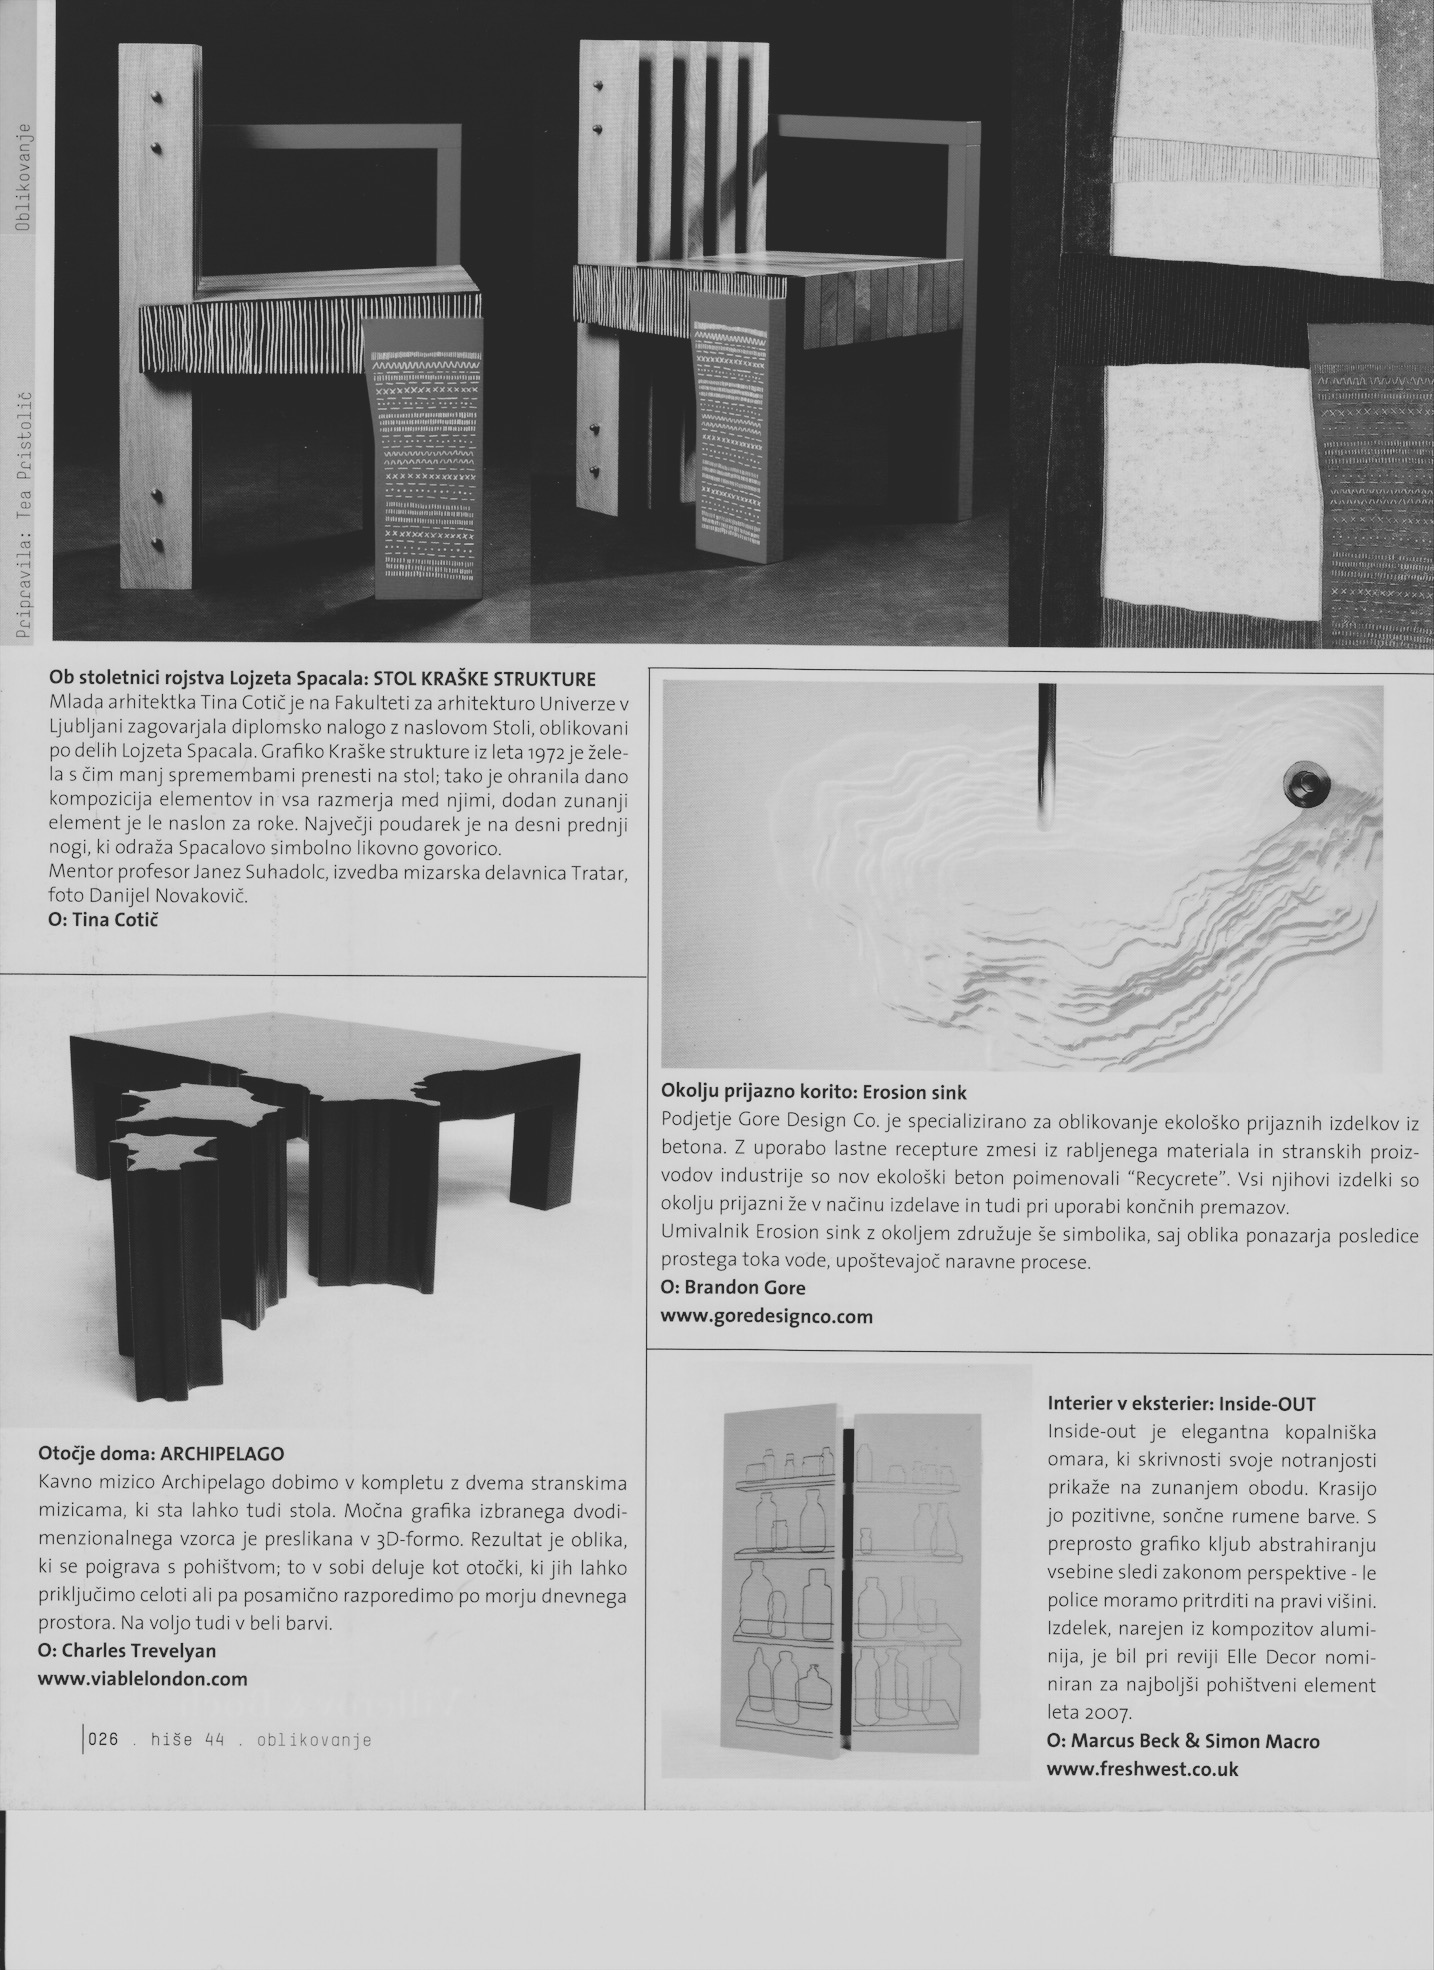 brandon-gore-print-publications-concrete-7079.JPG